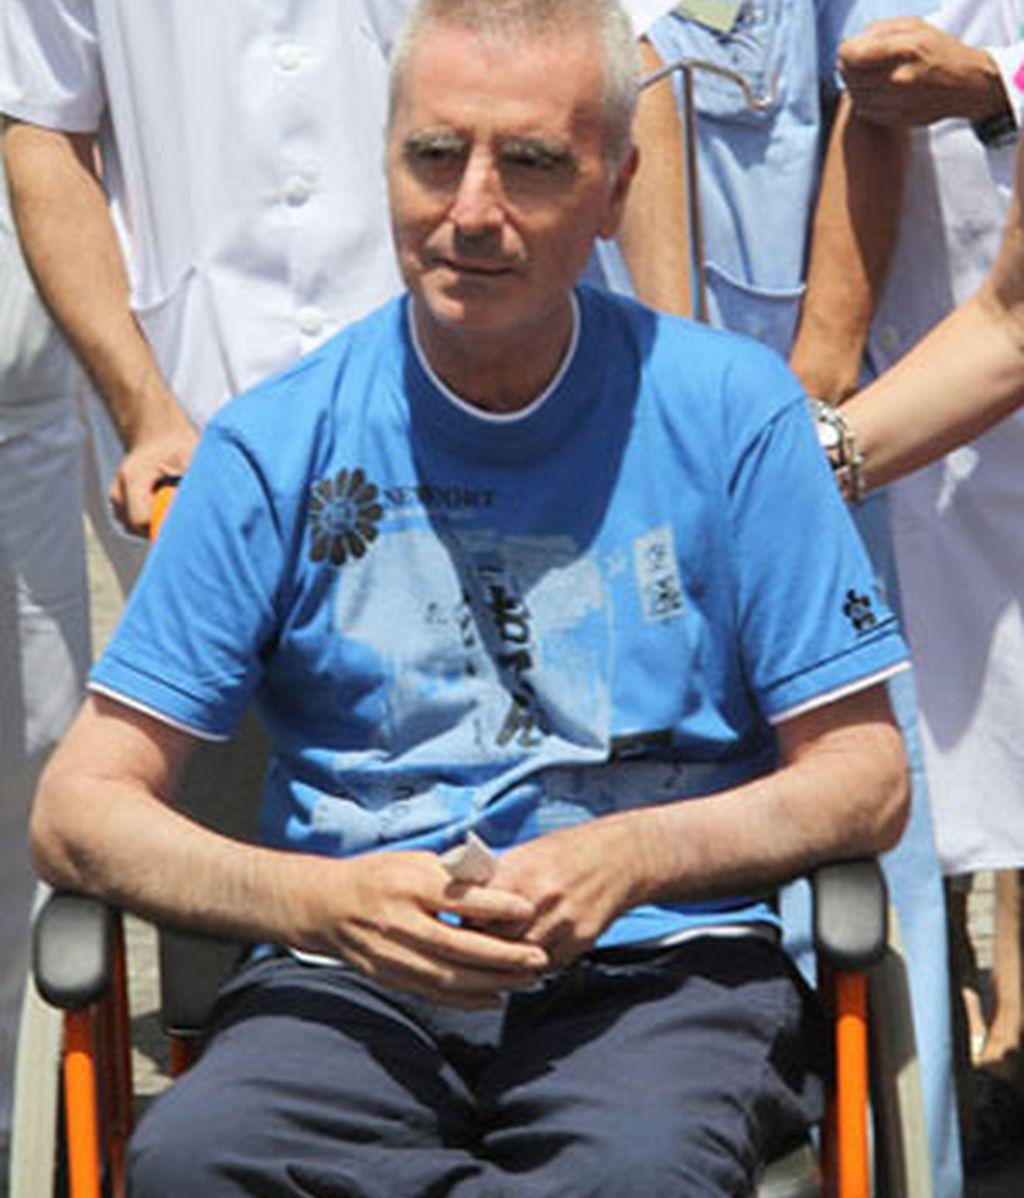 Ortega Cano, a su salida del hospital. Foto. EFE